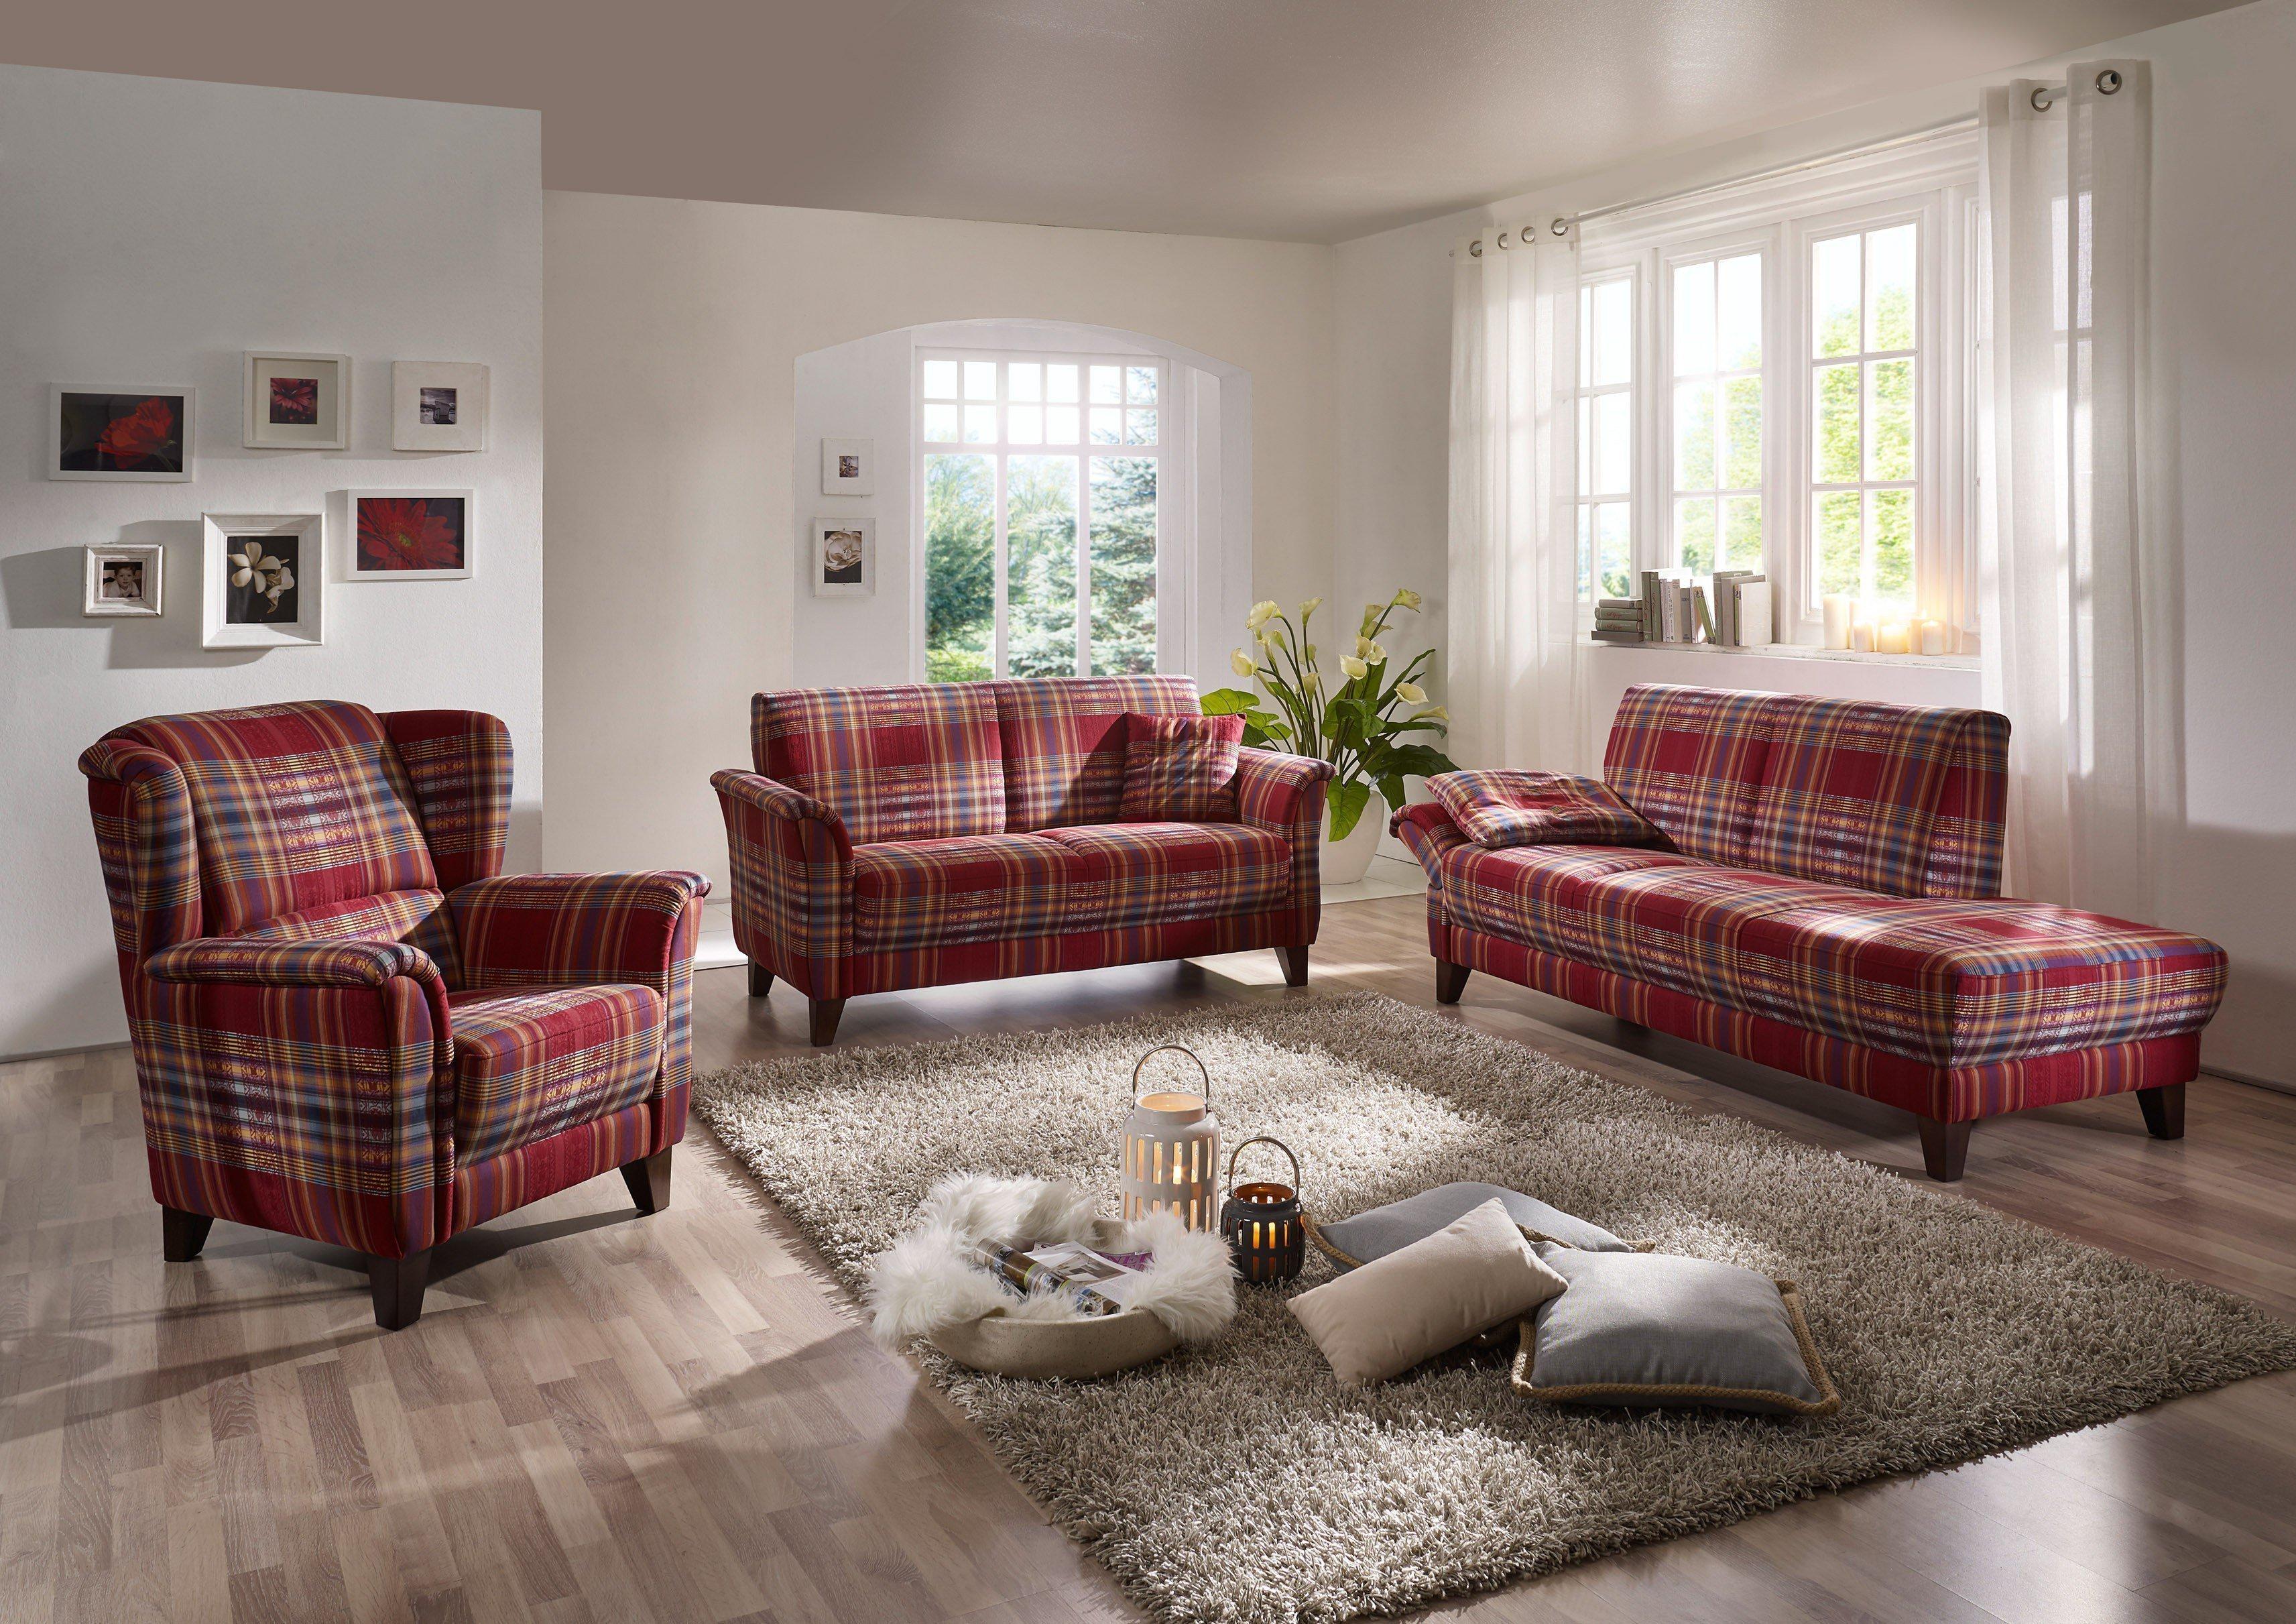 ponsel polstergruppe london classic rot kariert m bel. Black Bedroom Furniture Sets. Home Design Ideas